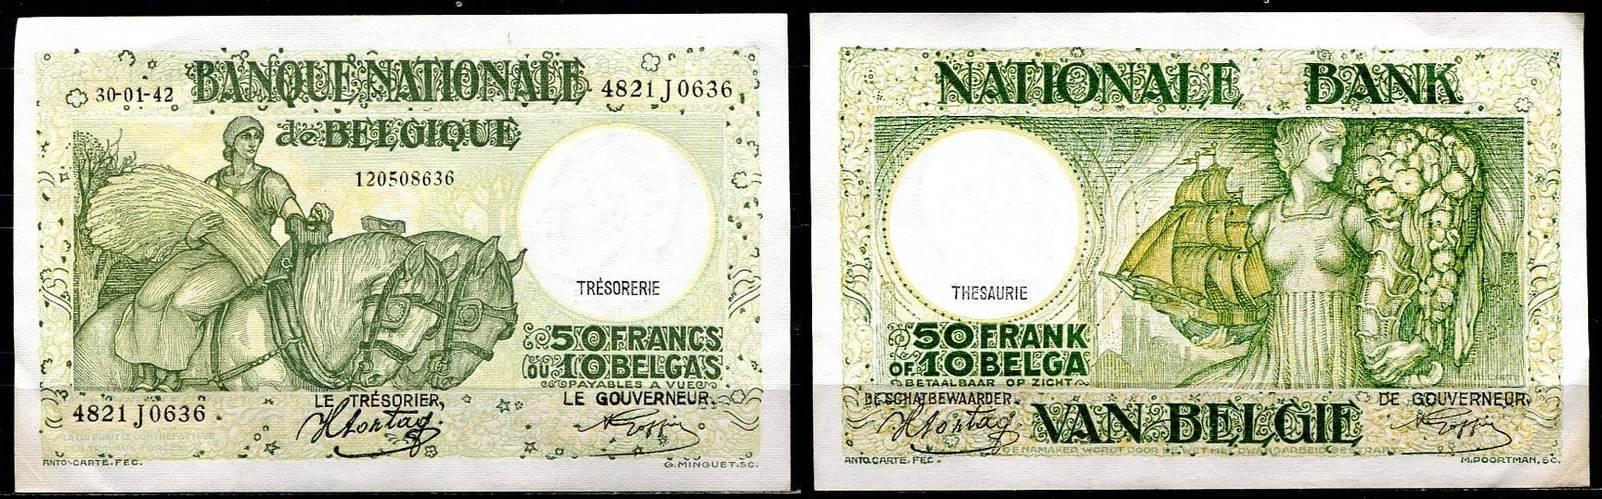 ~ Banque Nationale de Belgique / 10 Belgas Belgien 50 Francs 1942